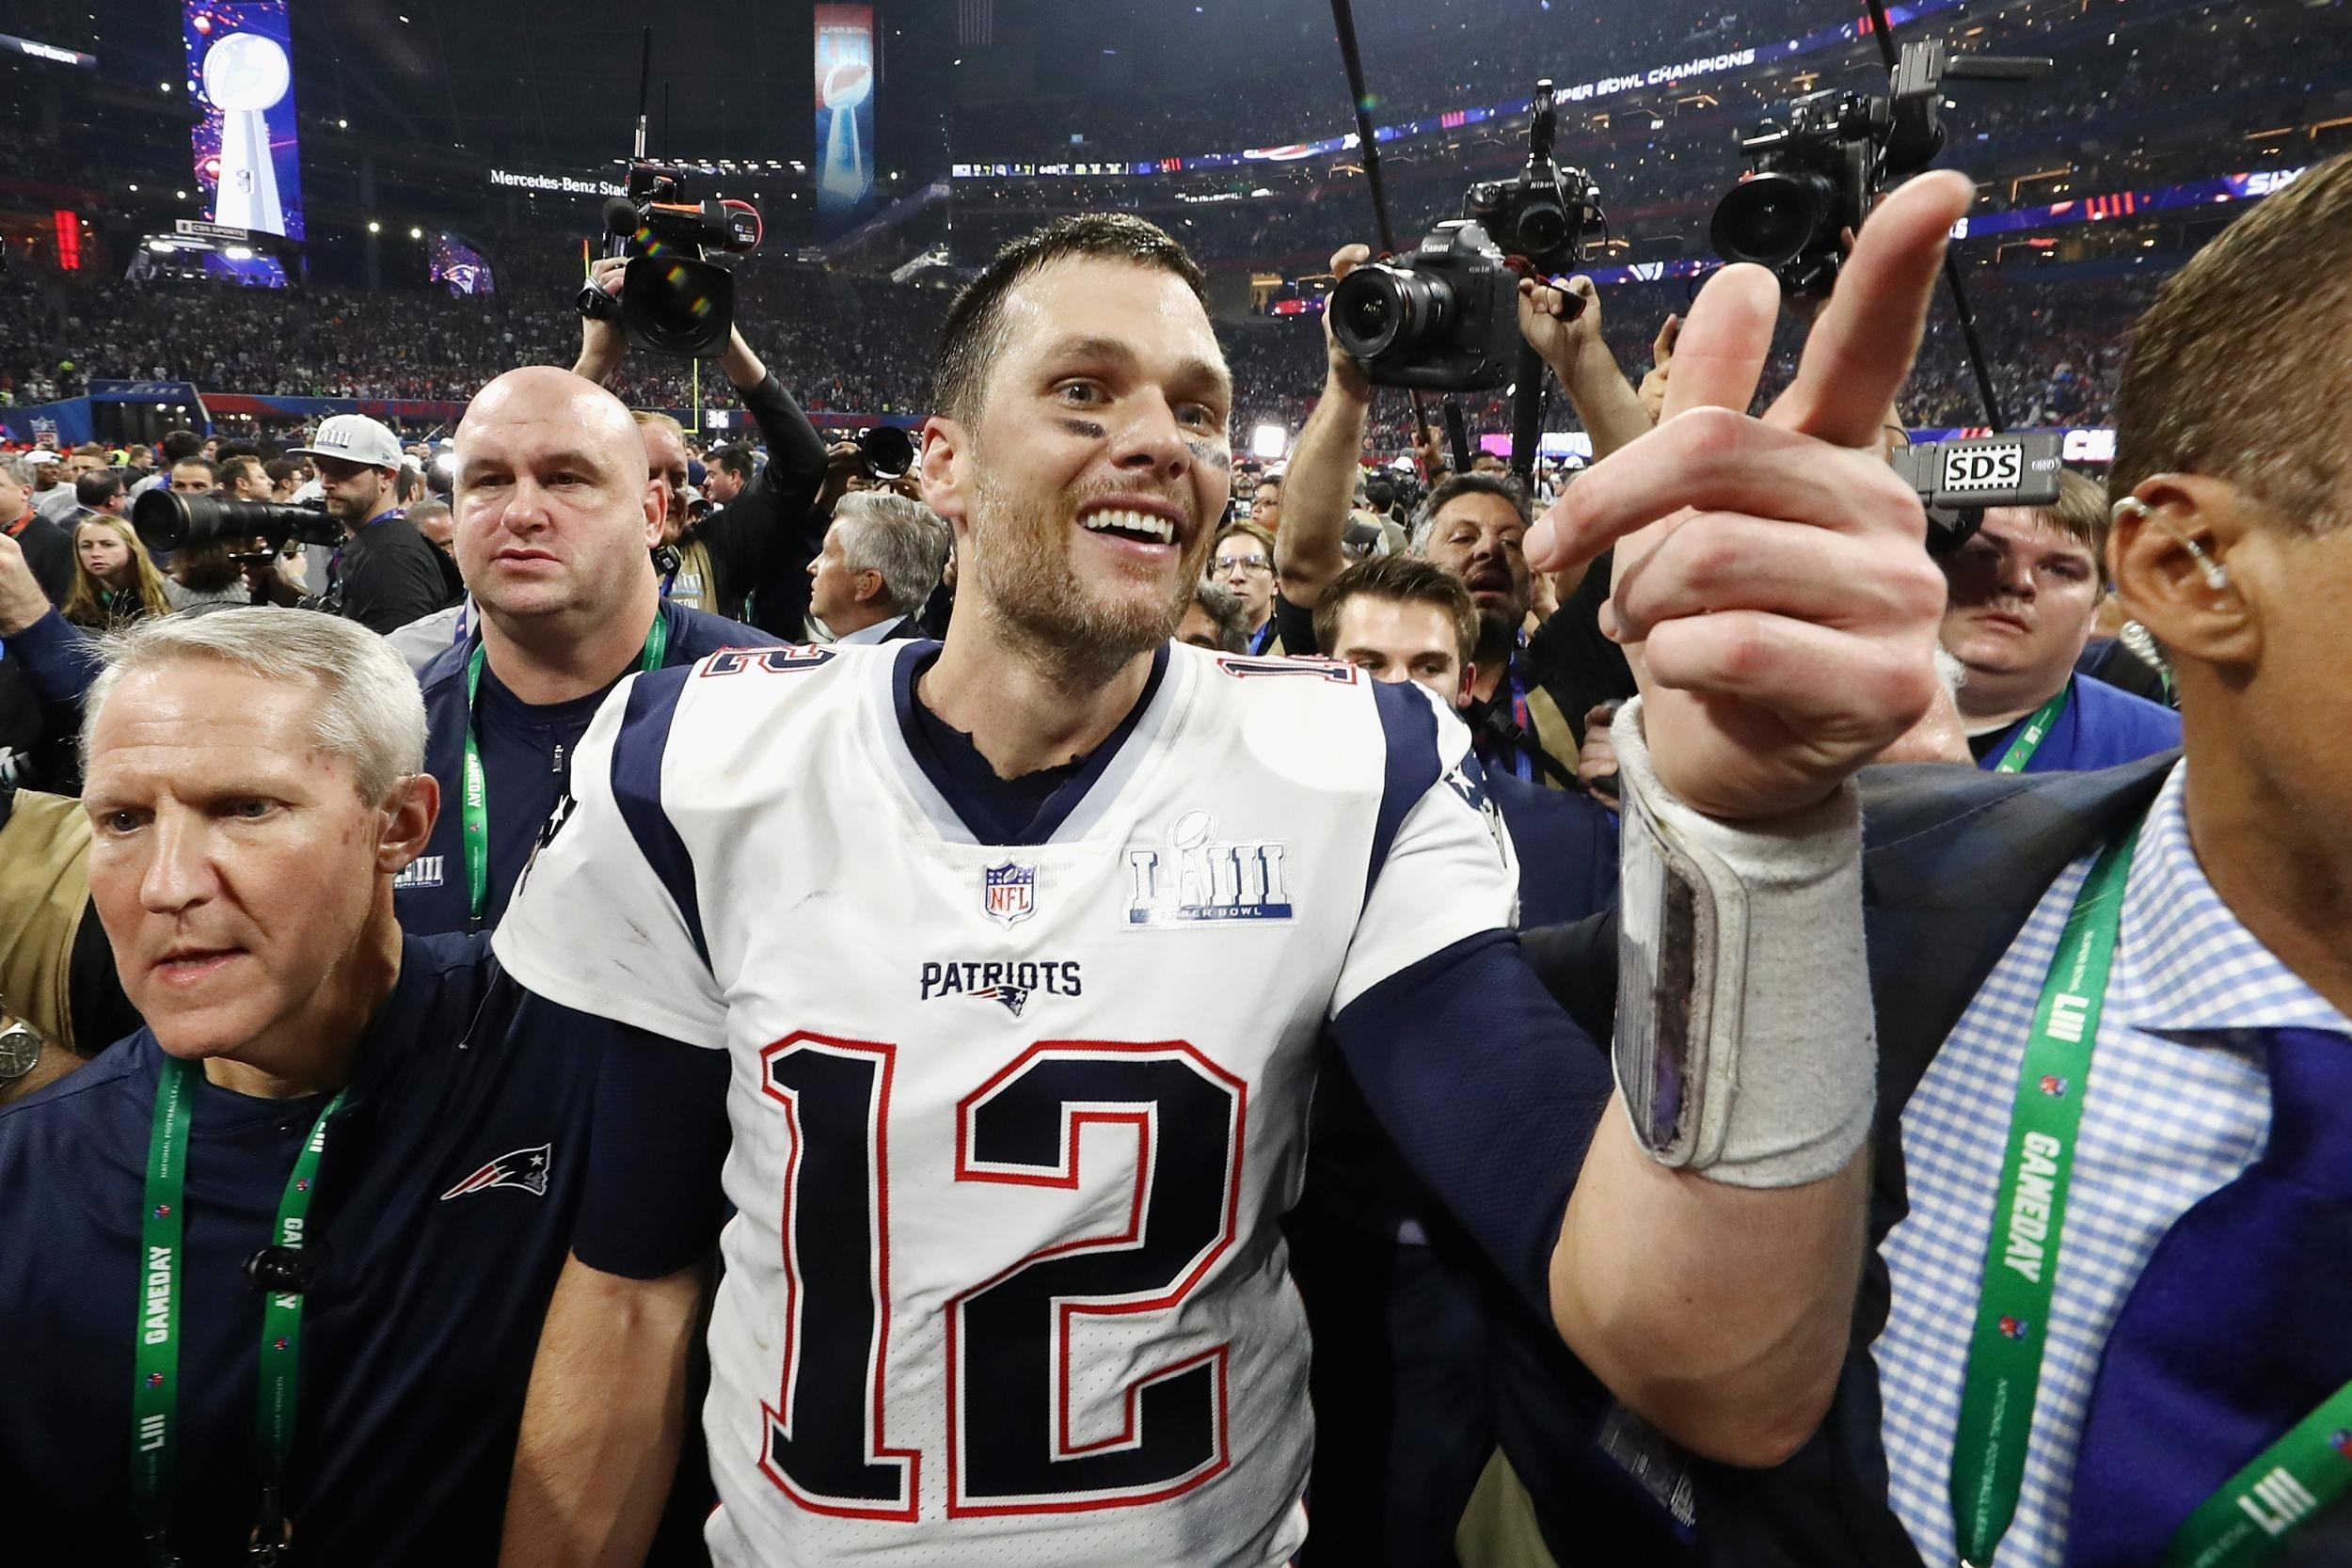 Super Bowl 2019 Attendance: La Rams Vs New England Patriots throughout Super Bowl Attendance 2019